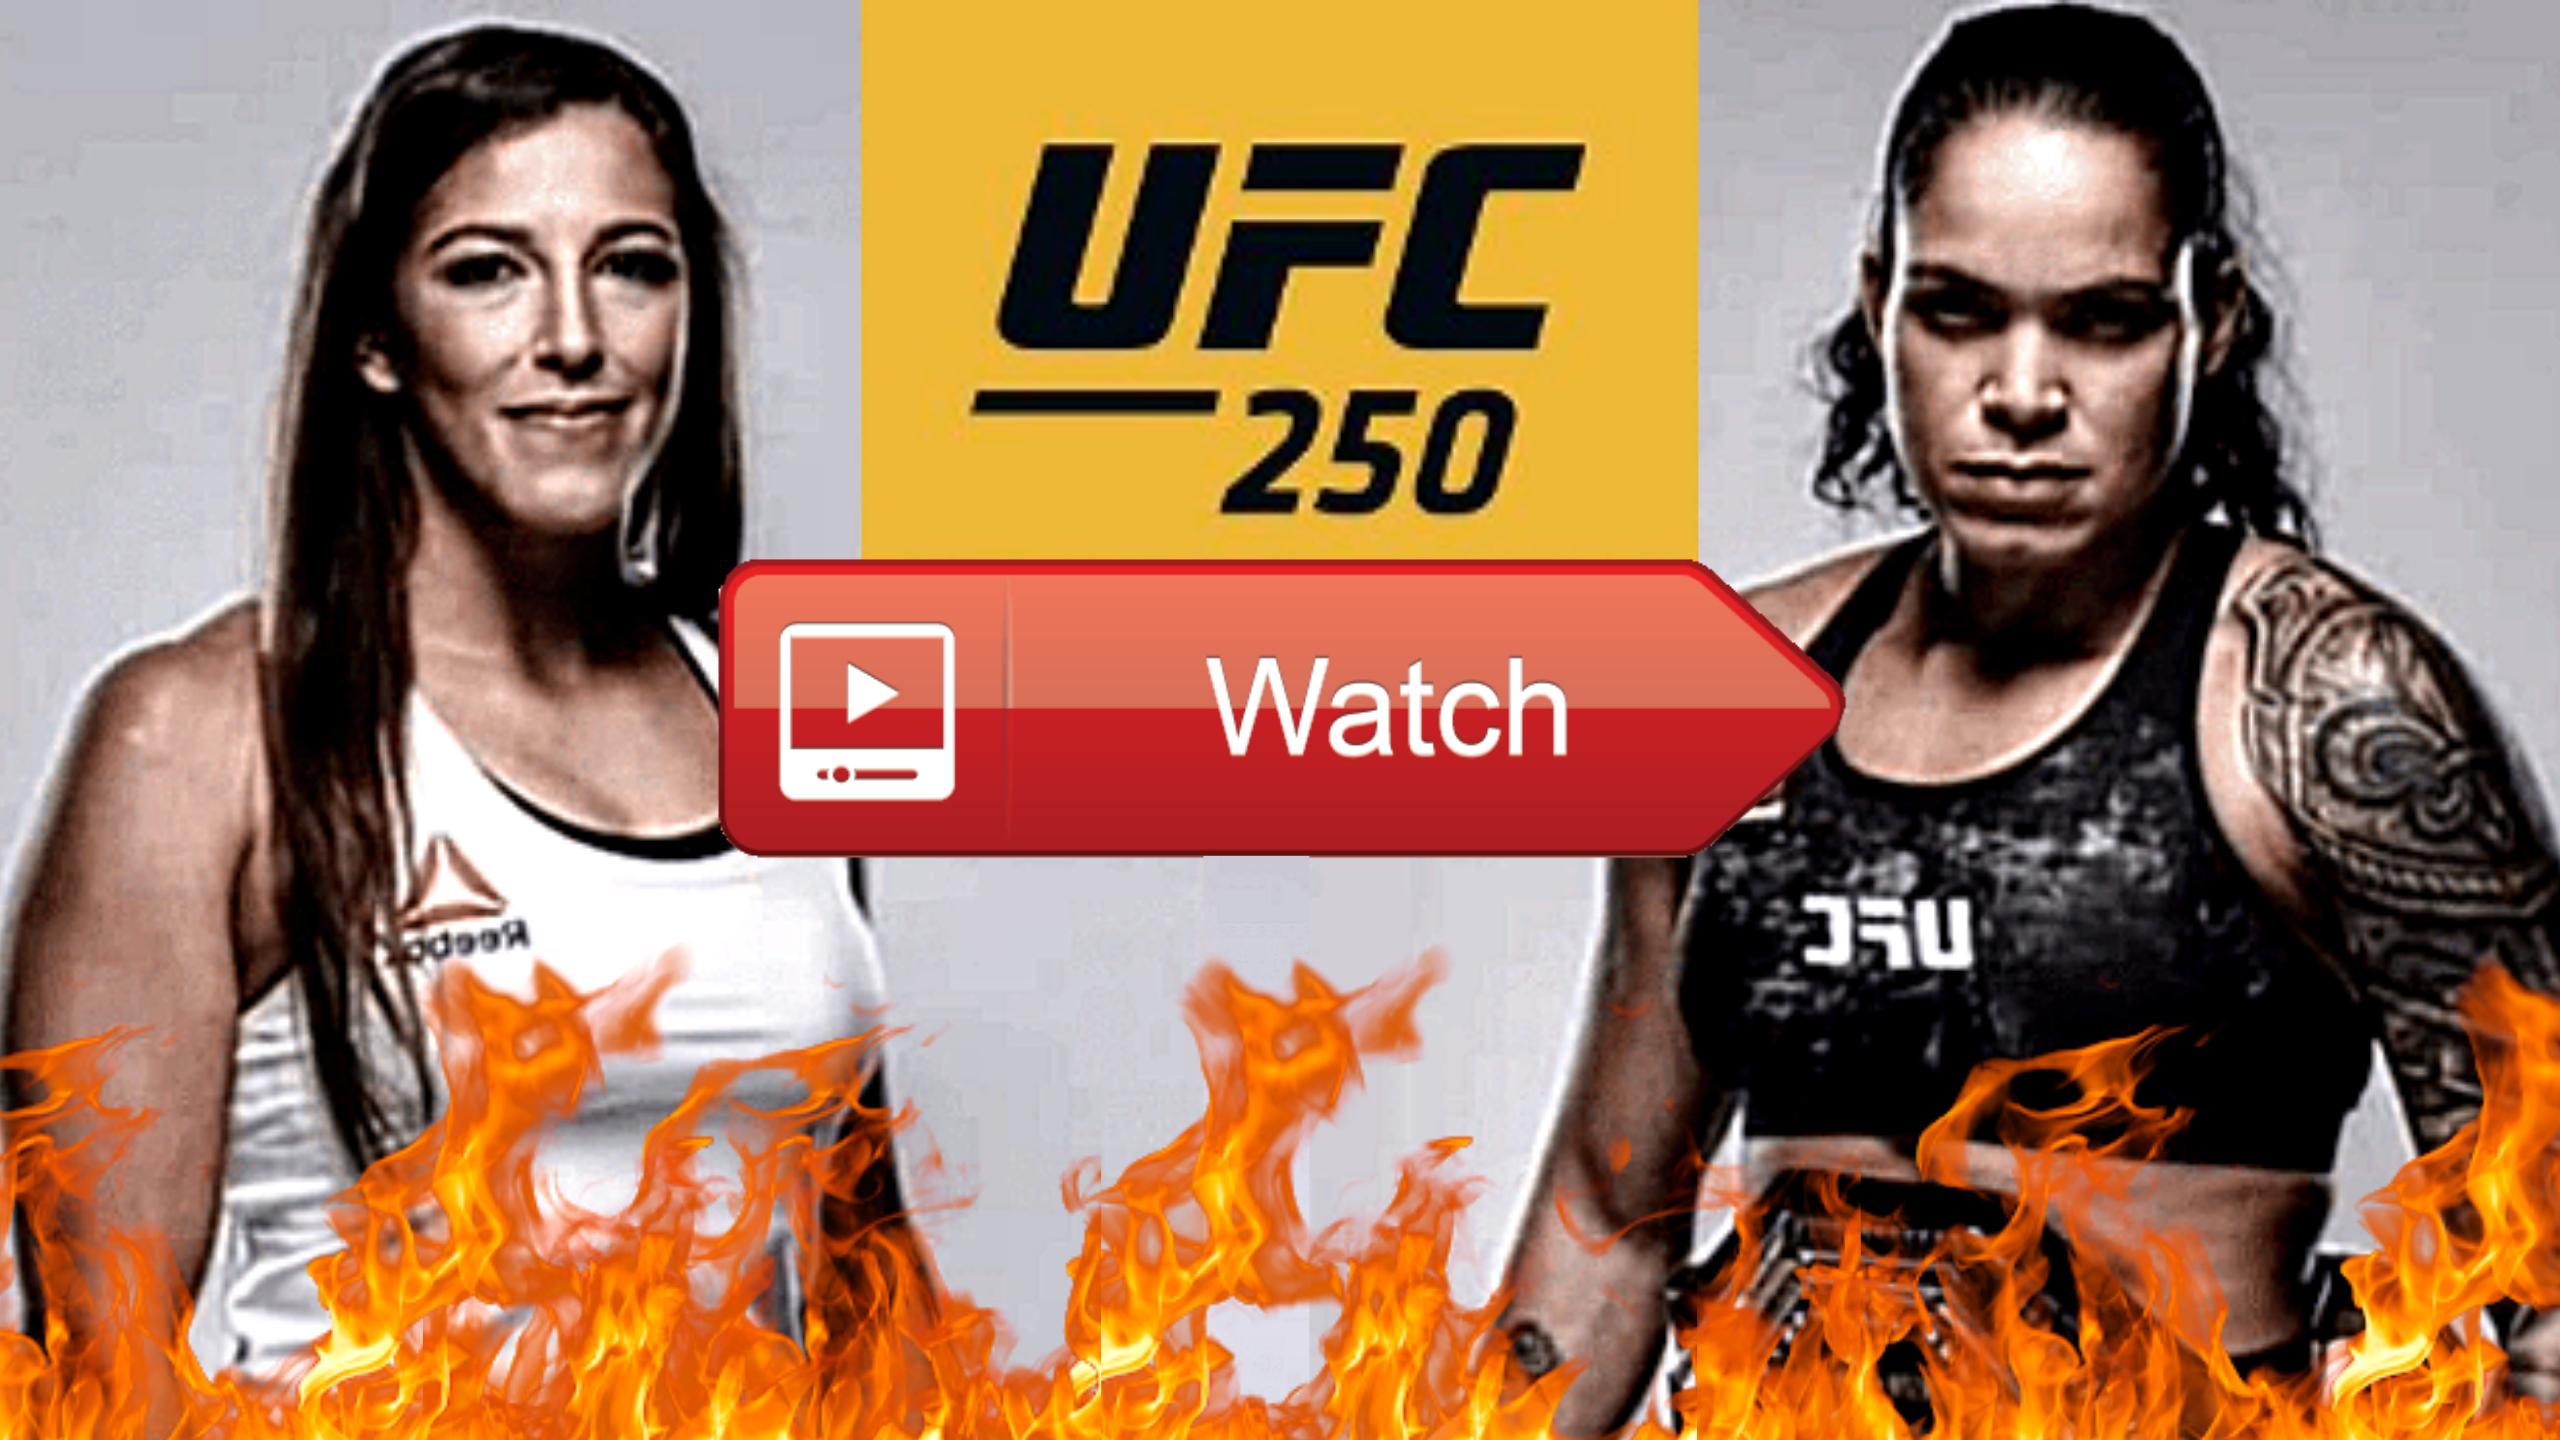 Live! UFC 250 Live Streaming in 2020 Ufc live, Ufc, Ufc